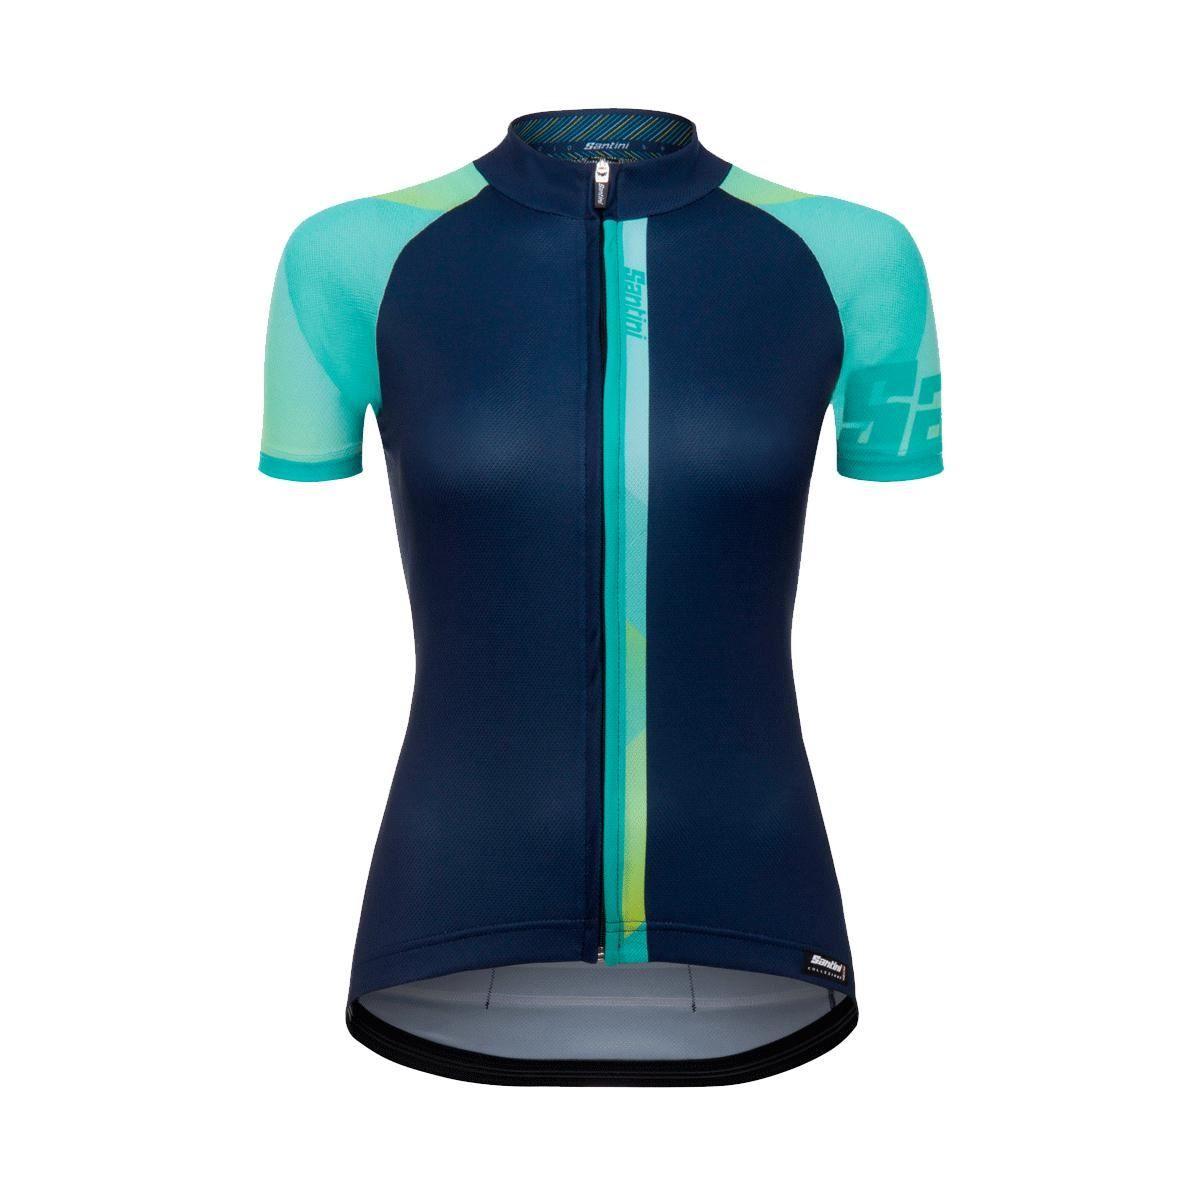 Santini Womens Giada Short Sleeve Jersey 2018: Aqua S